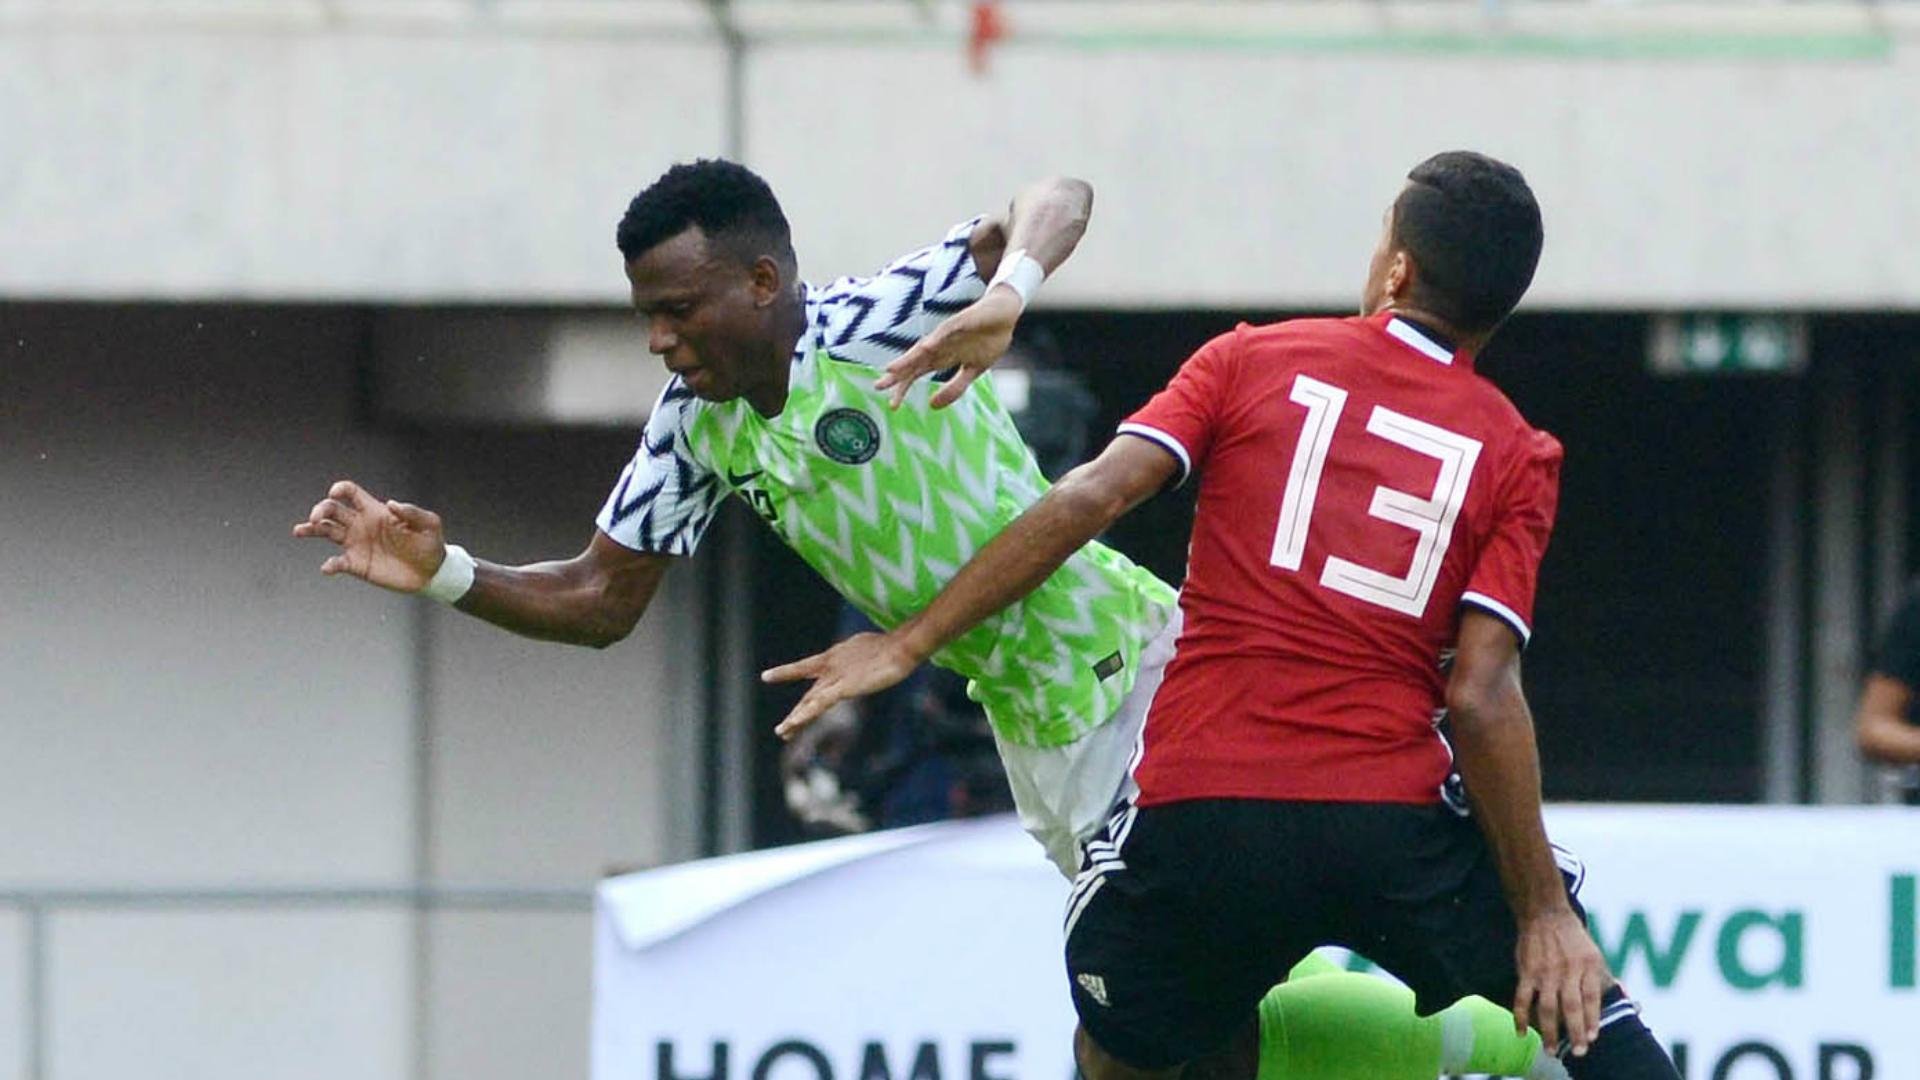 Coronavirus: Bursaspor and Super Eagles star Abdullahi sends message to fans